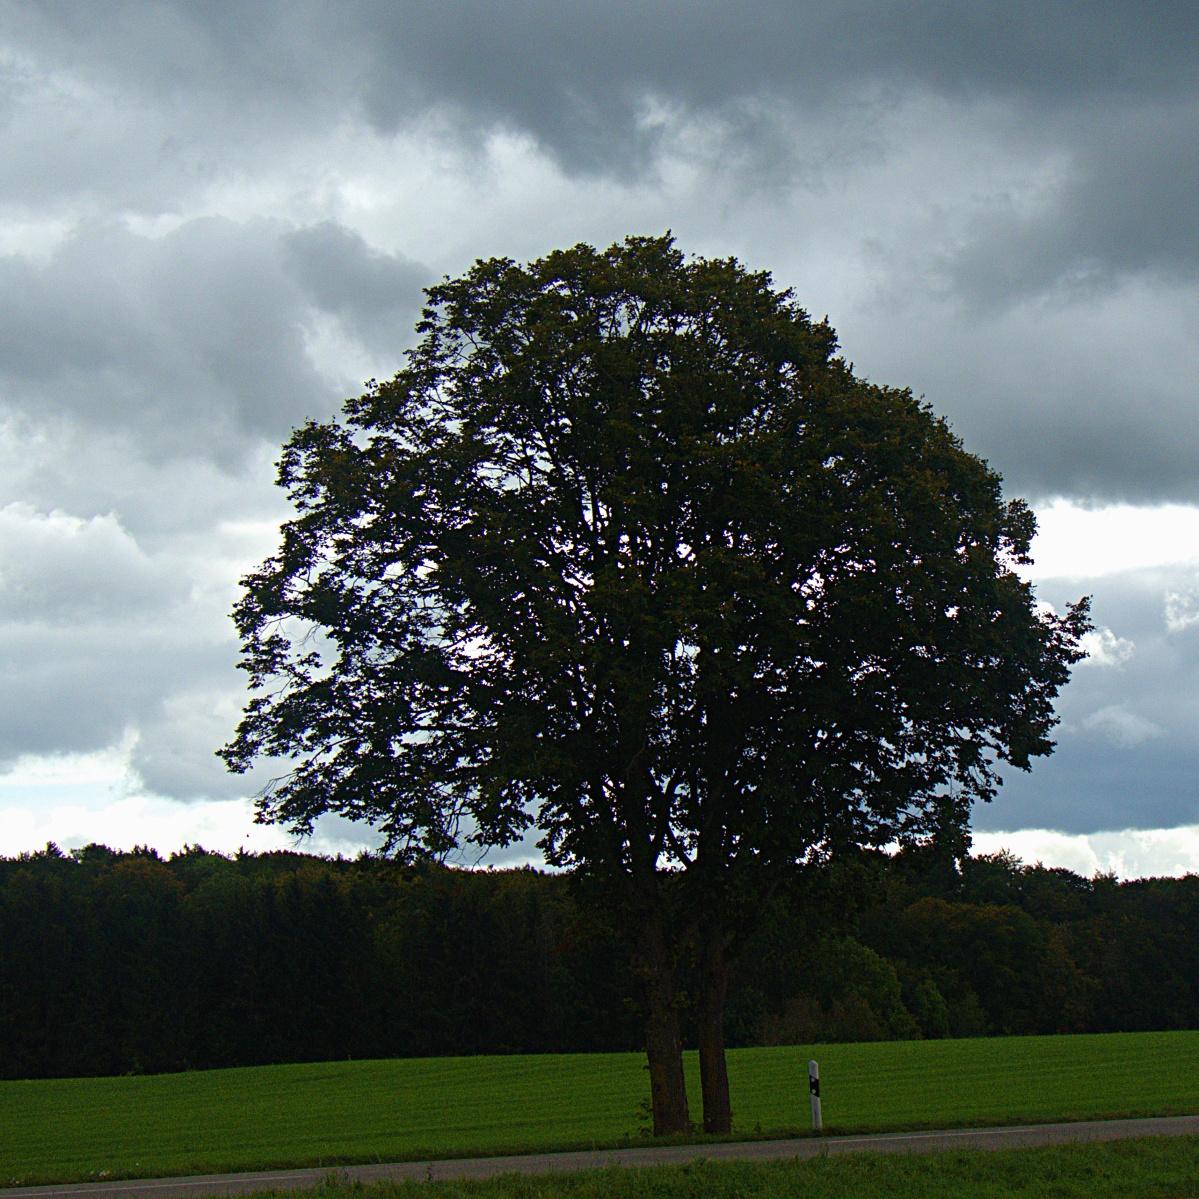 Bäume am Straßenrand